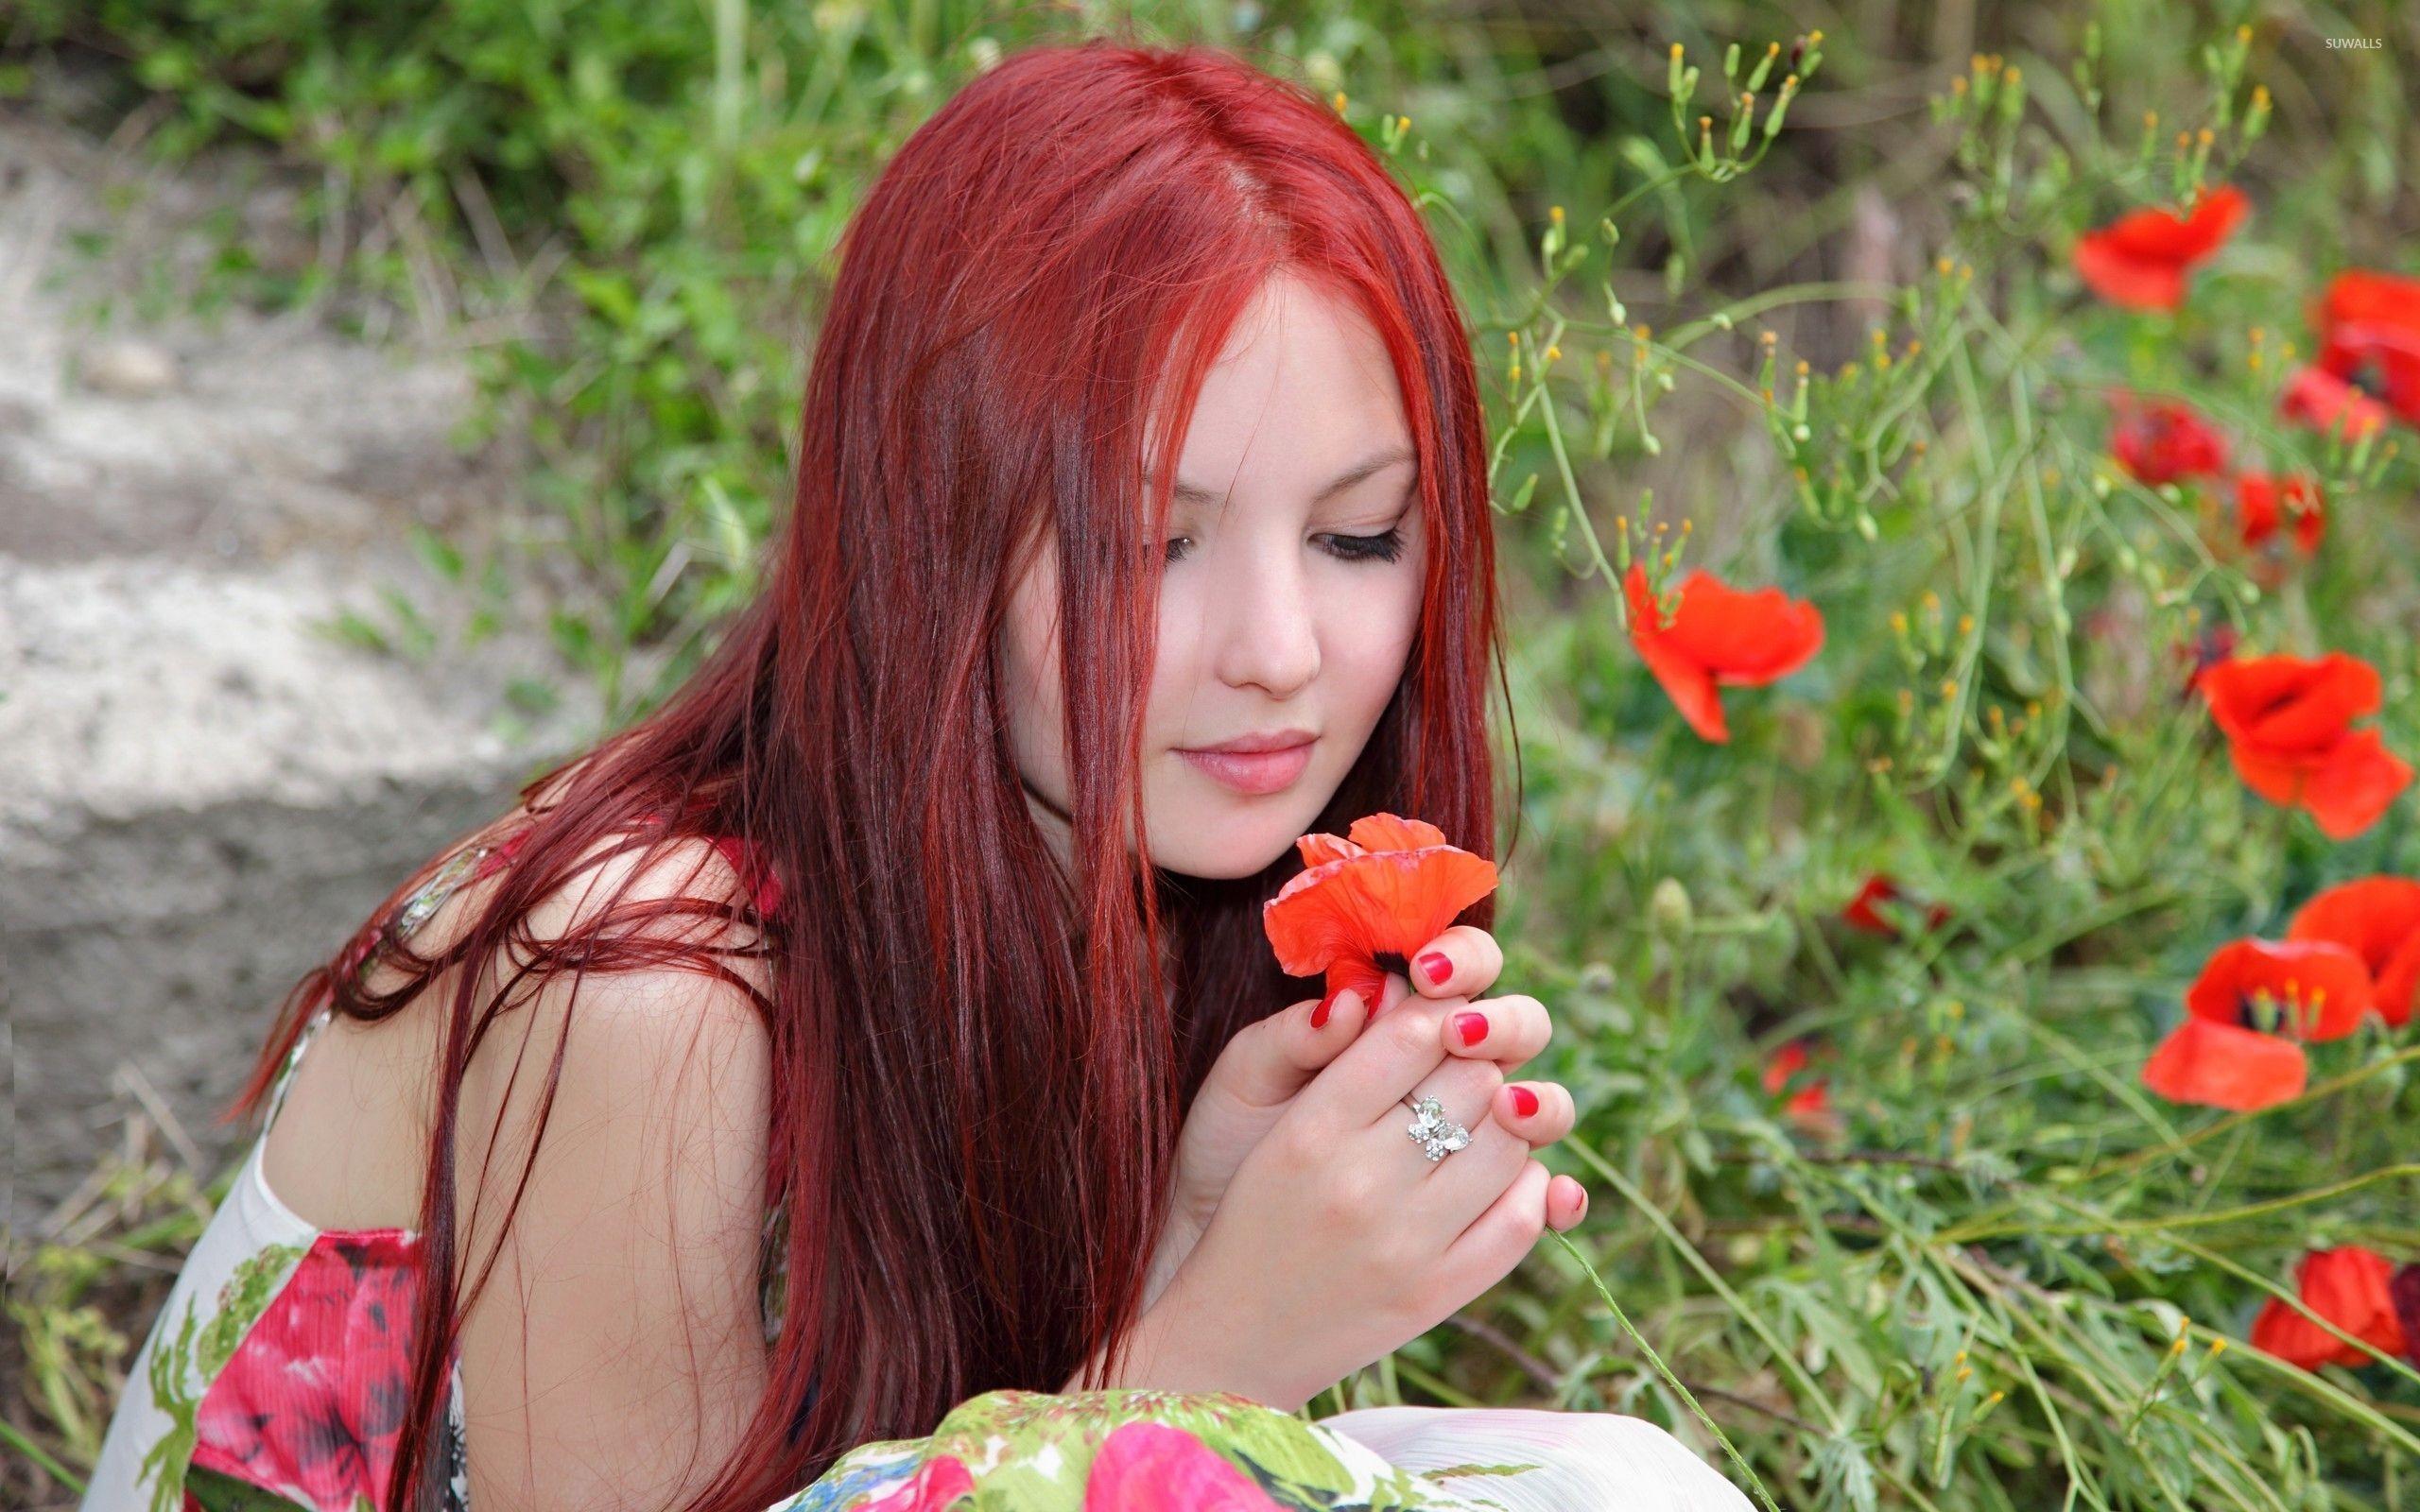 Redhead wallpaper jpg